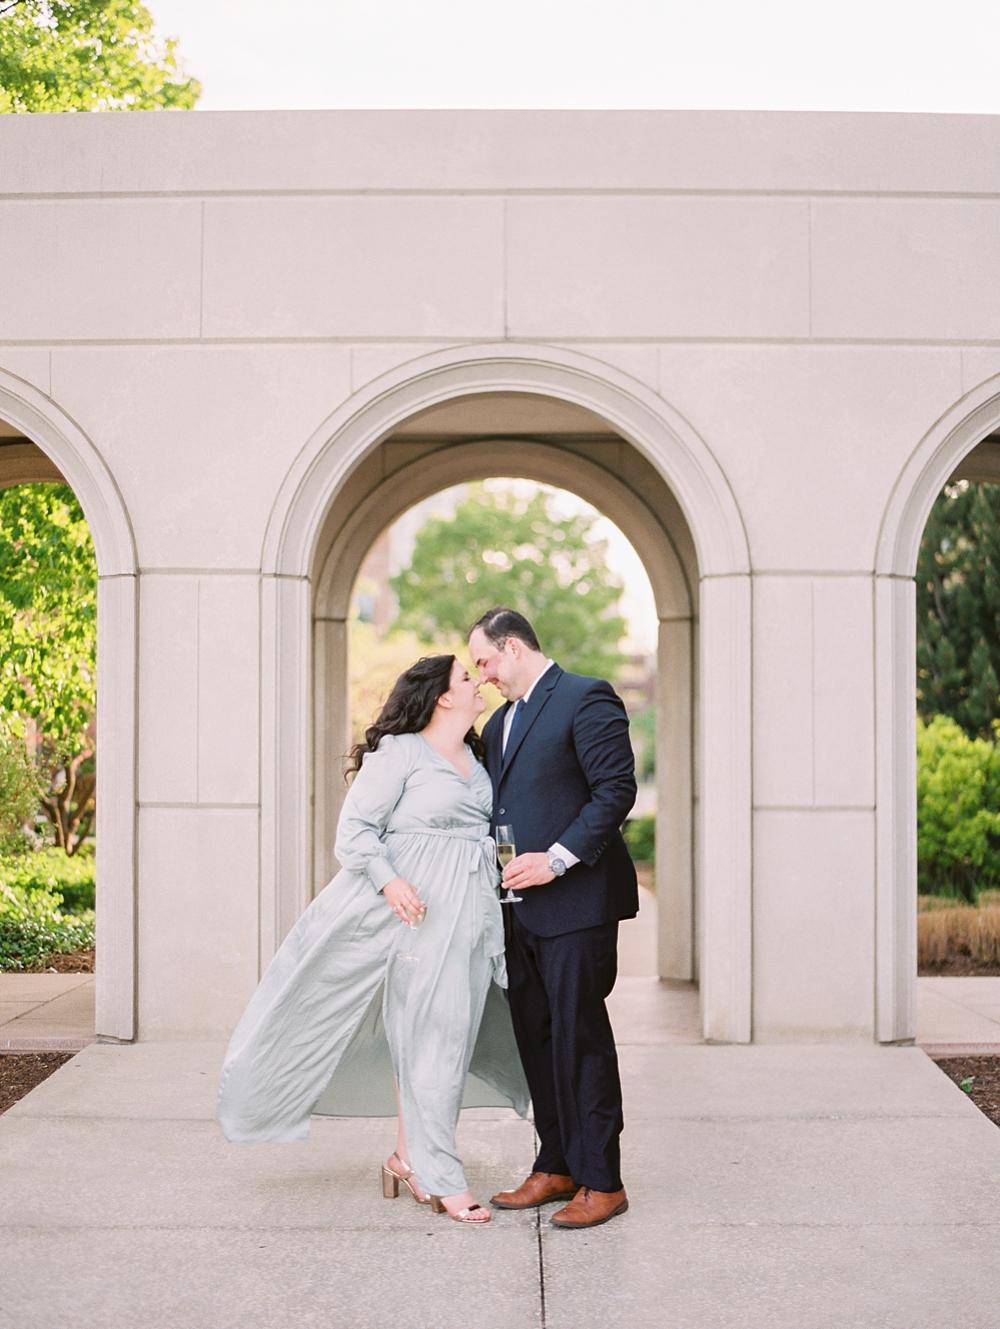 kristin-la-voie-photography-chicago-wedding-photographer-loyola-engagement-24